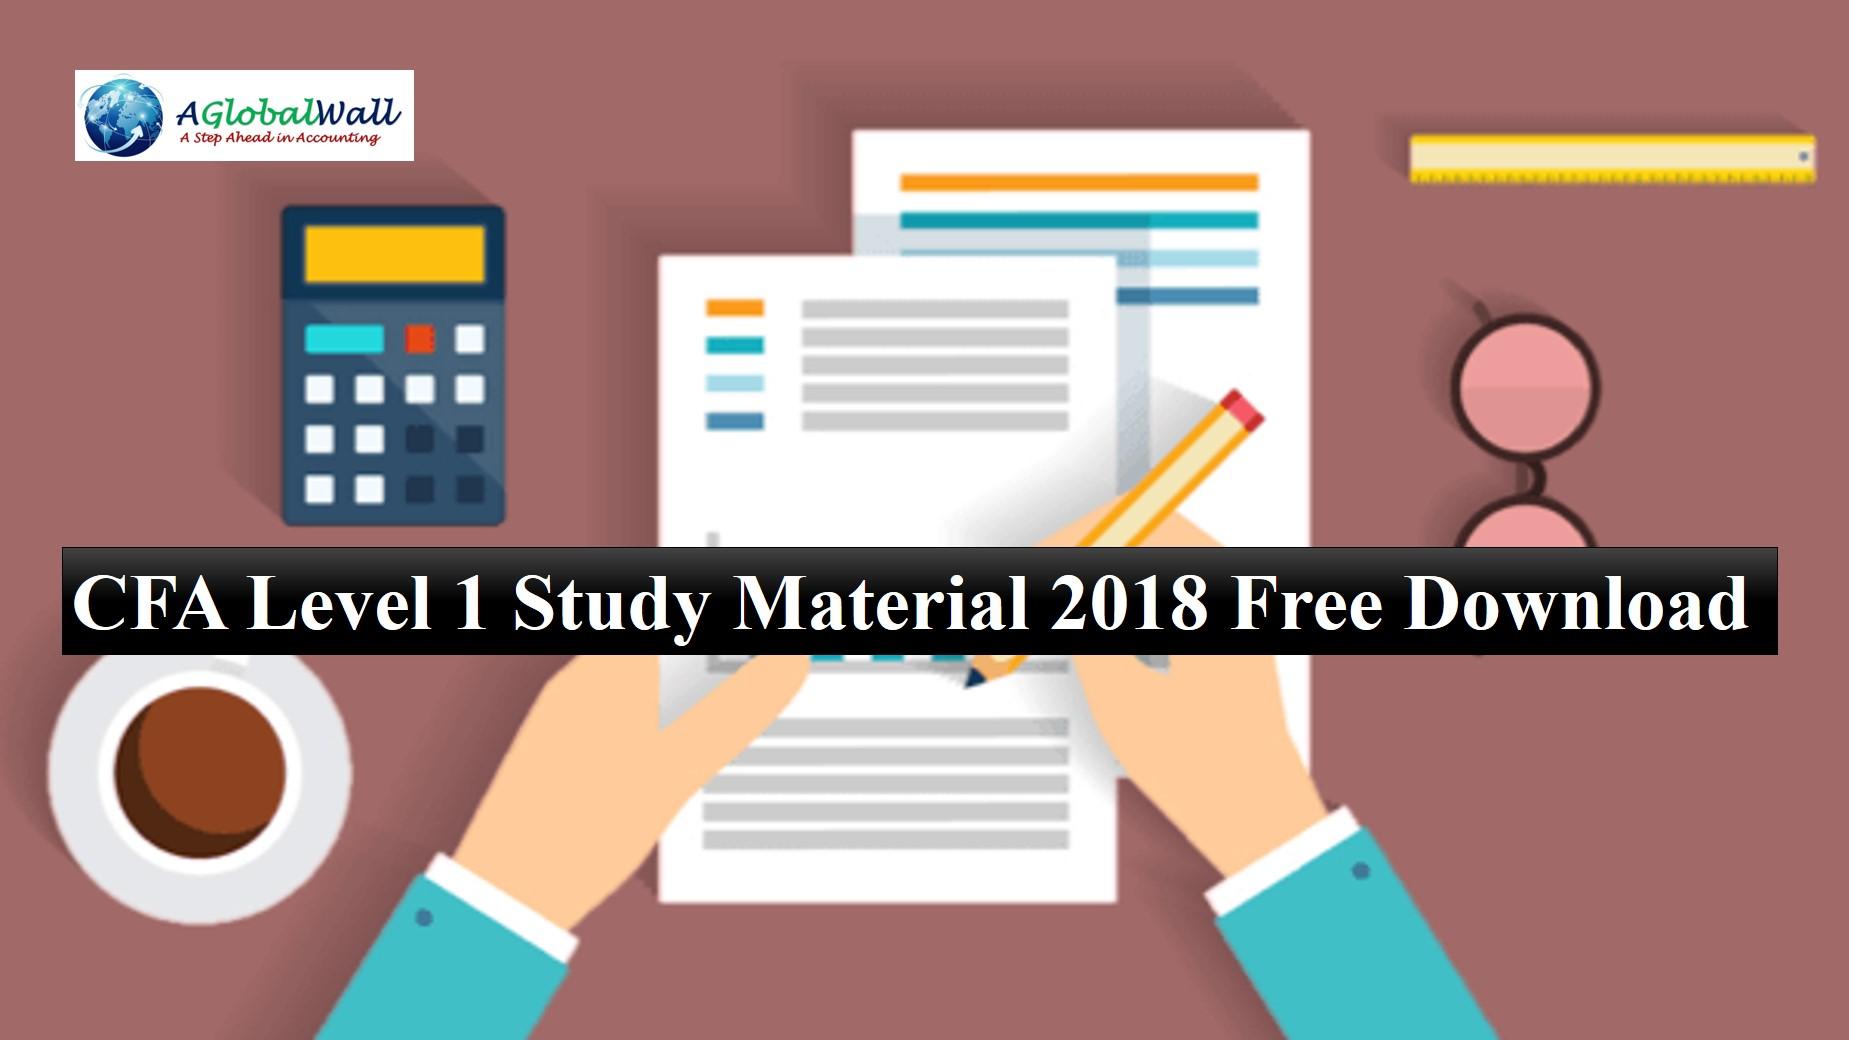 cfa level 1 material free download pdf